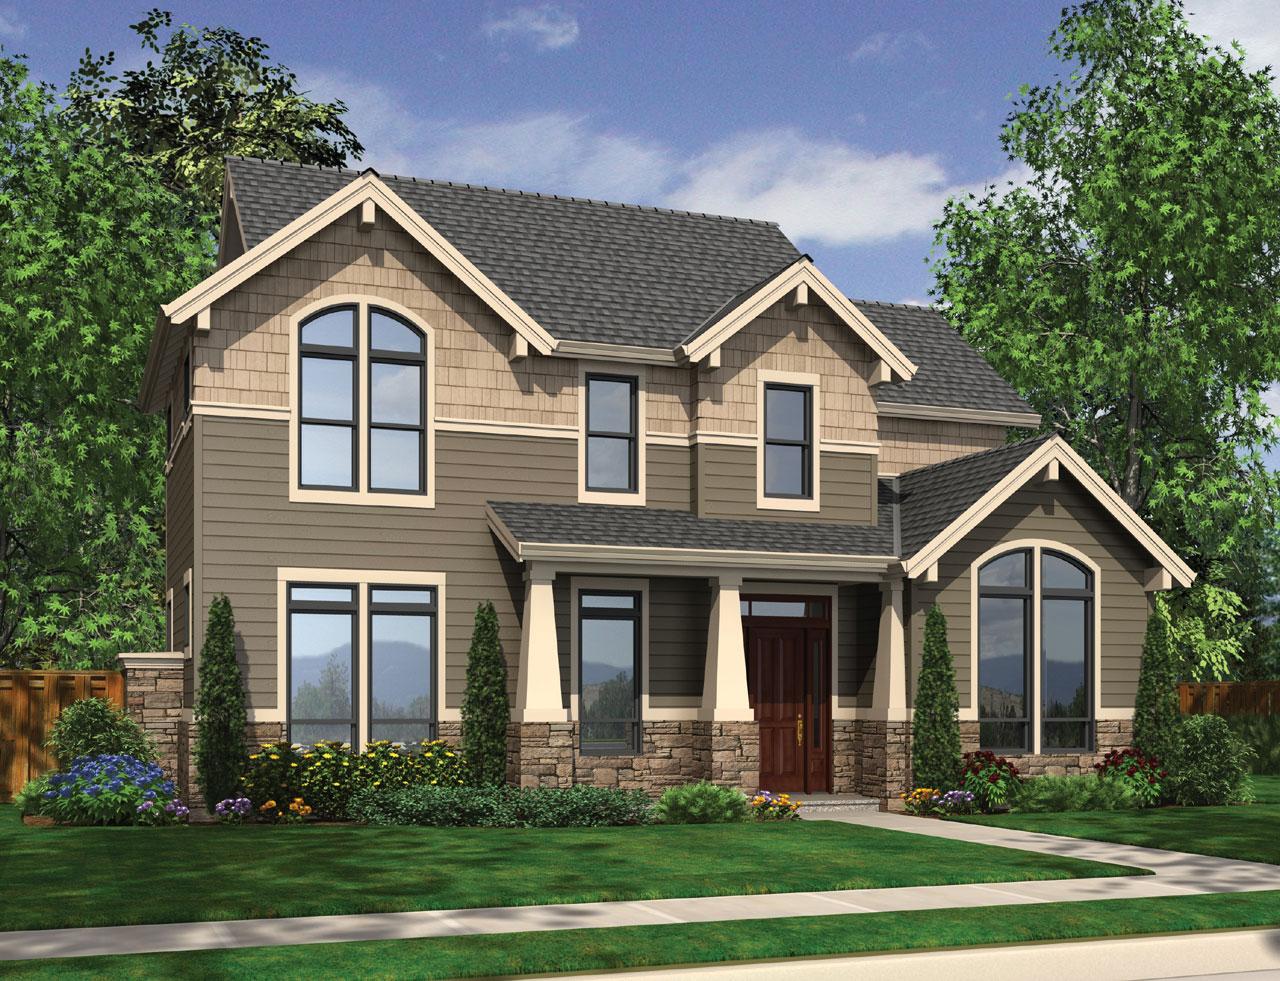 Craftsman Style House Plans Plan: 74-662